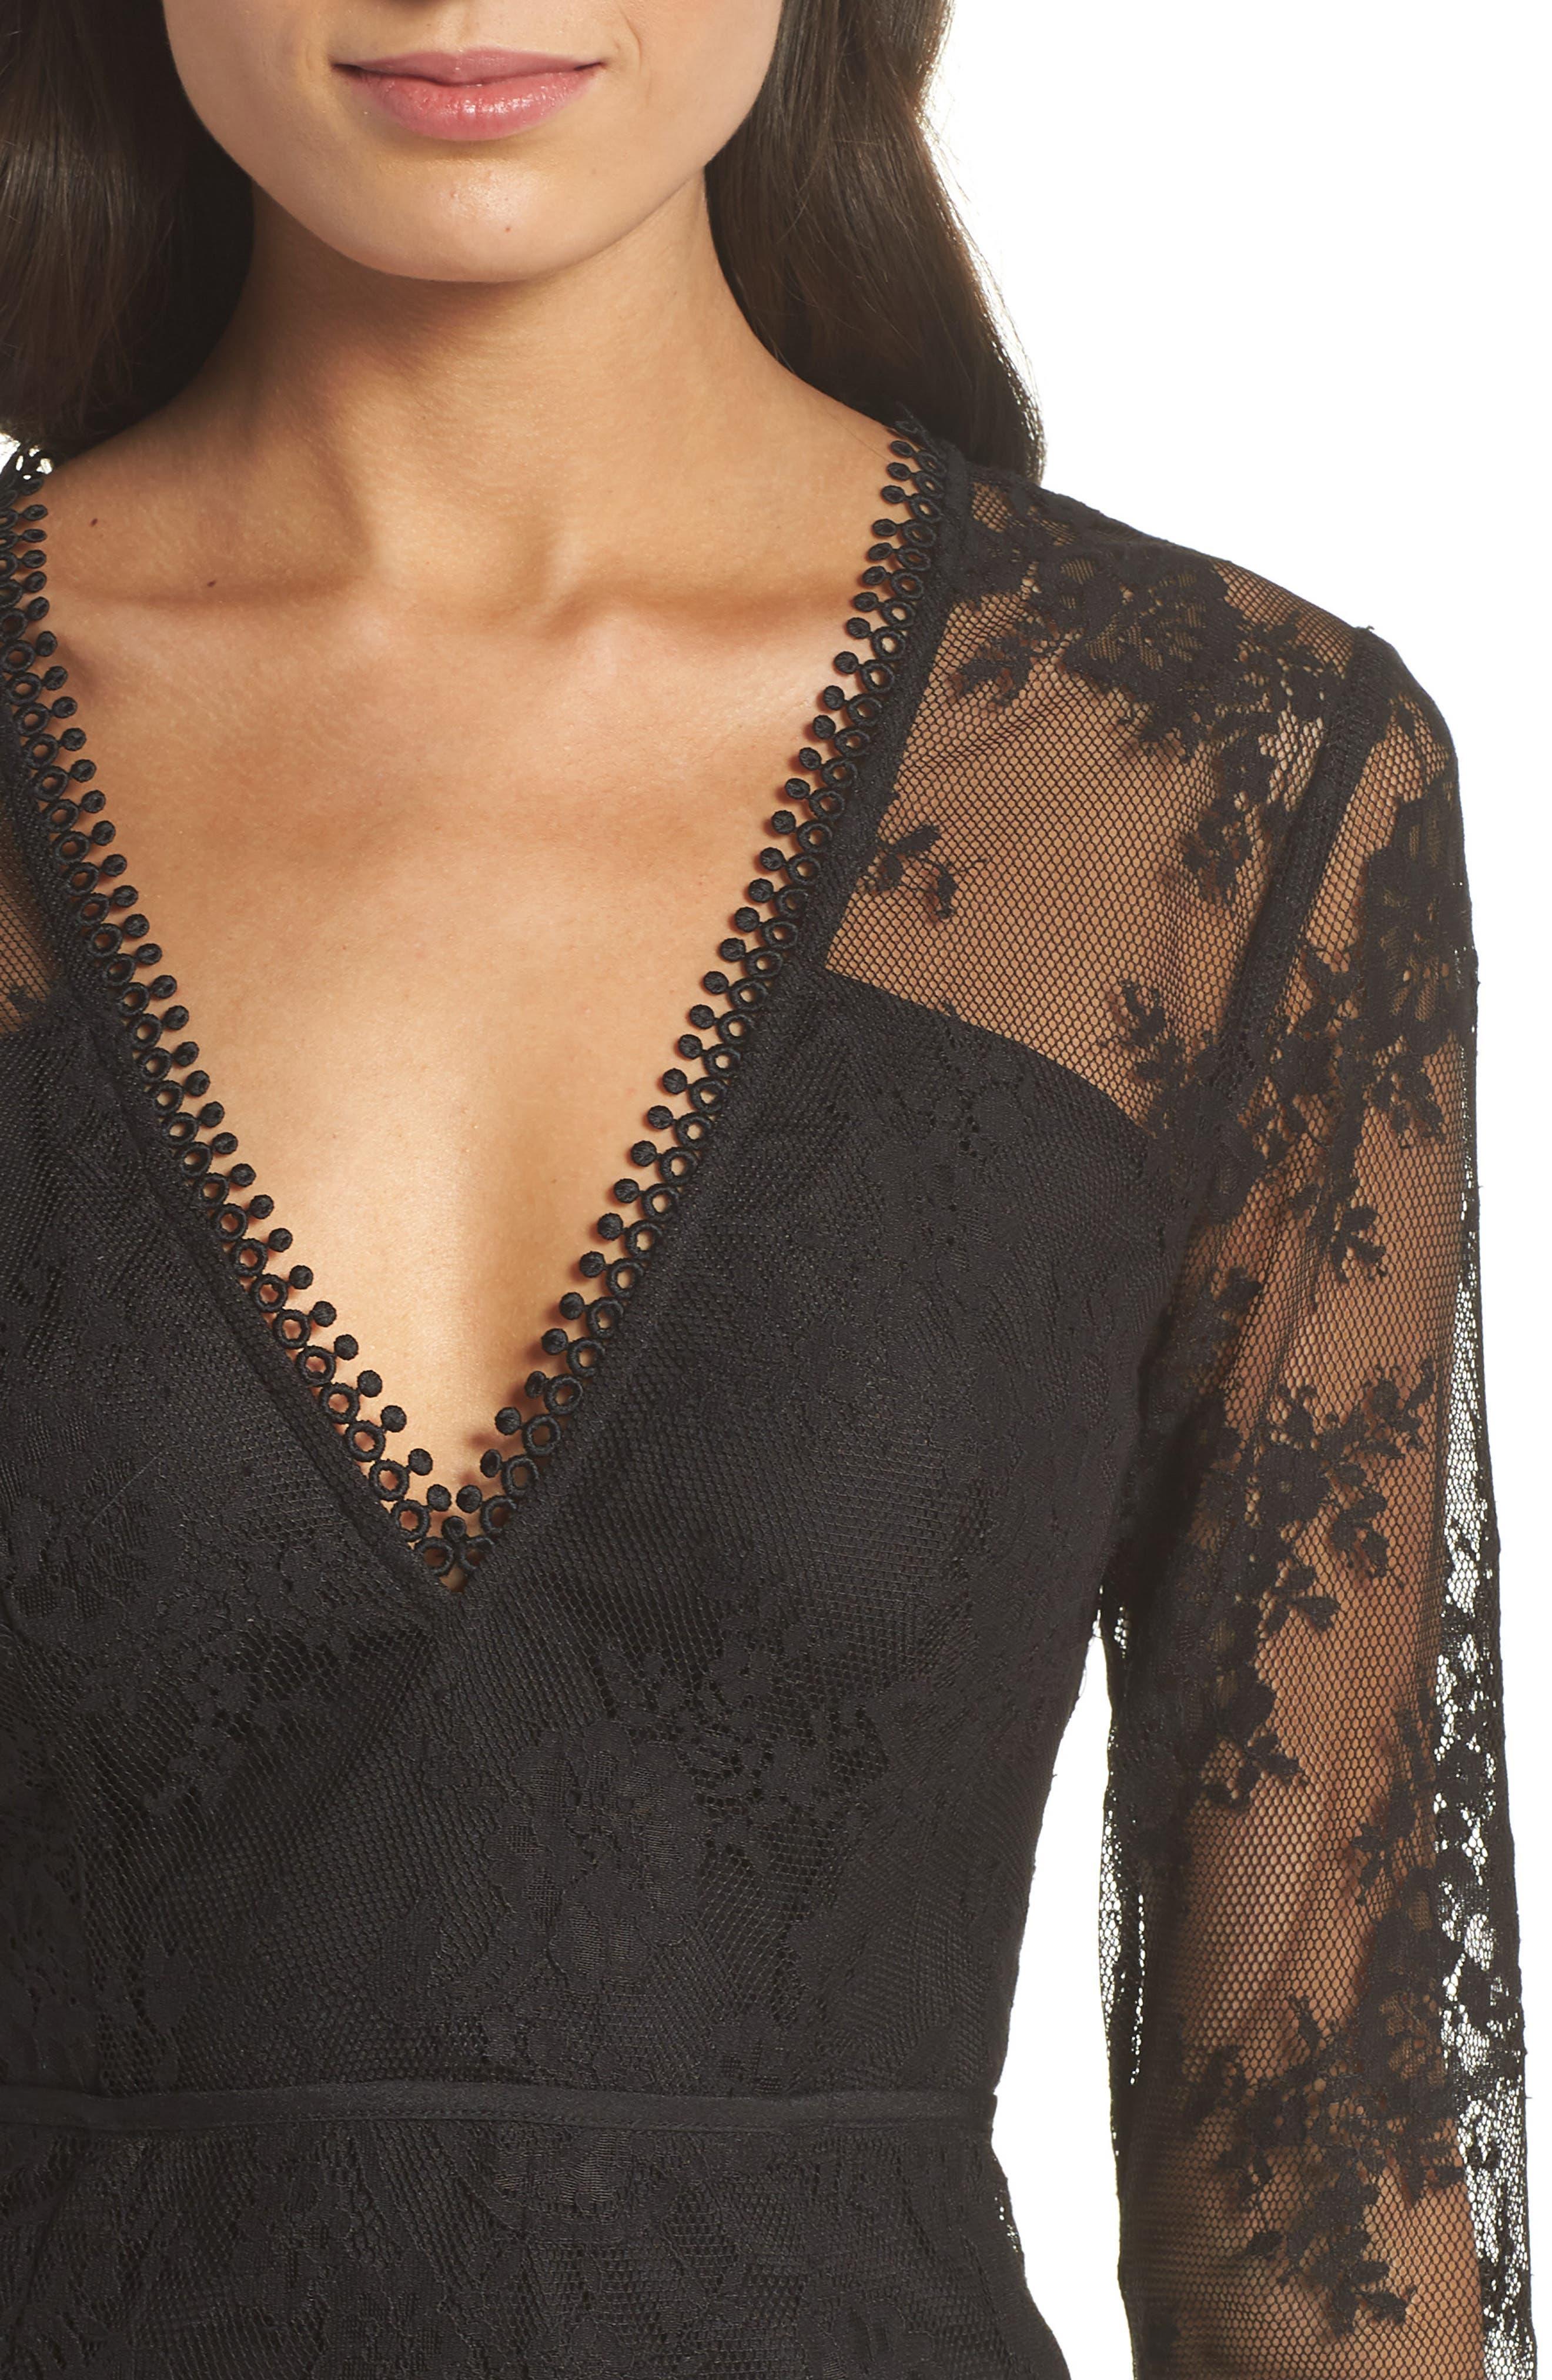 True Chemistry Lace Sheath Dress,                             Alternate thumbnail 4, color,                             Black